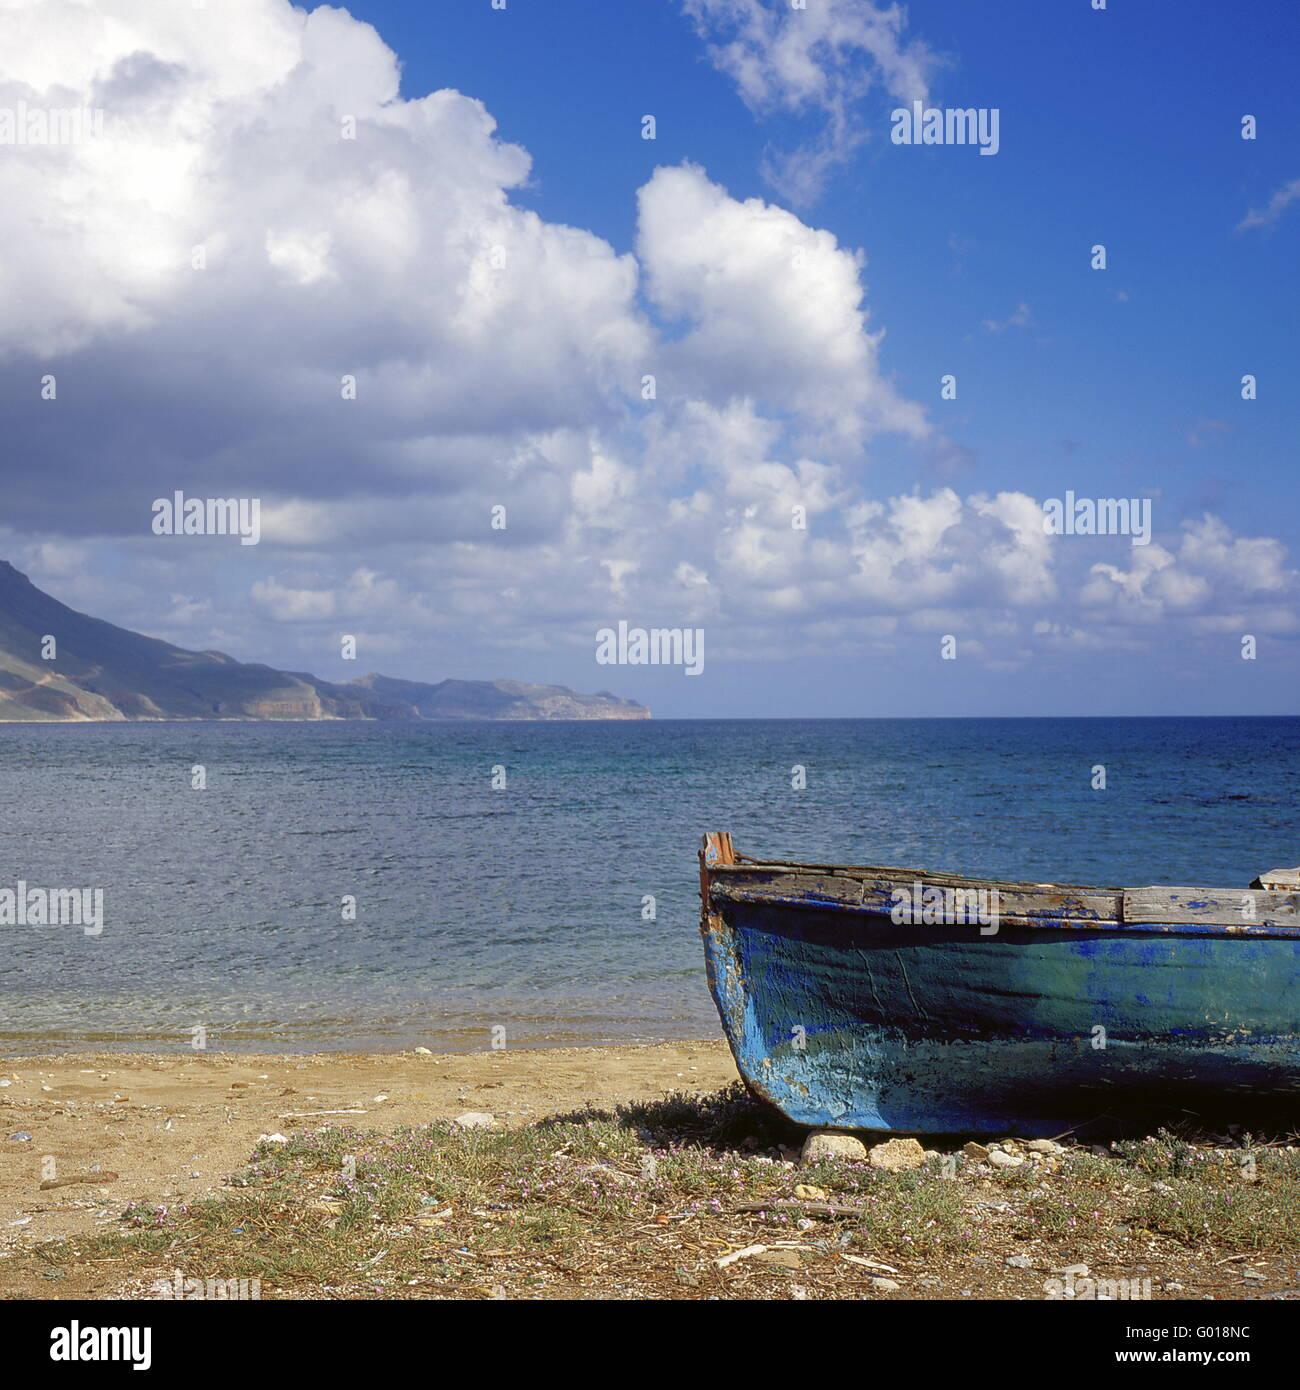 fishing boat at the beach o fCrete Island, Greece - Stock Image